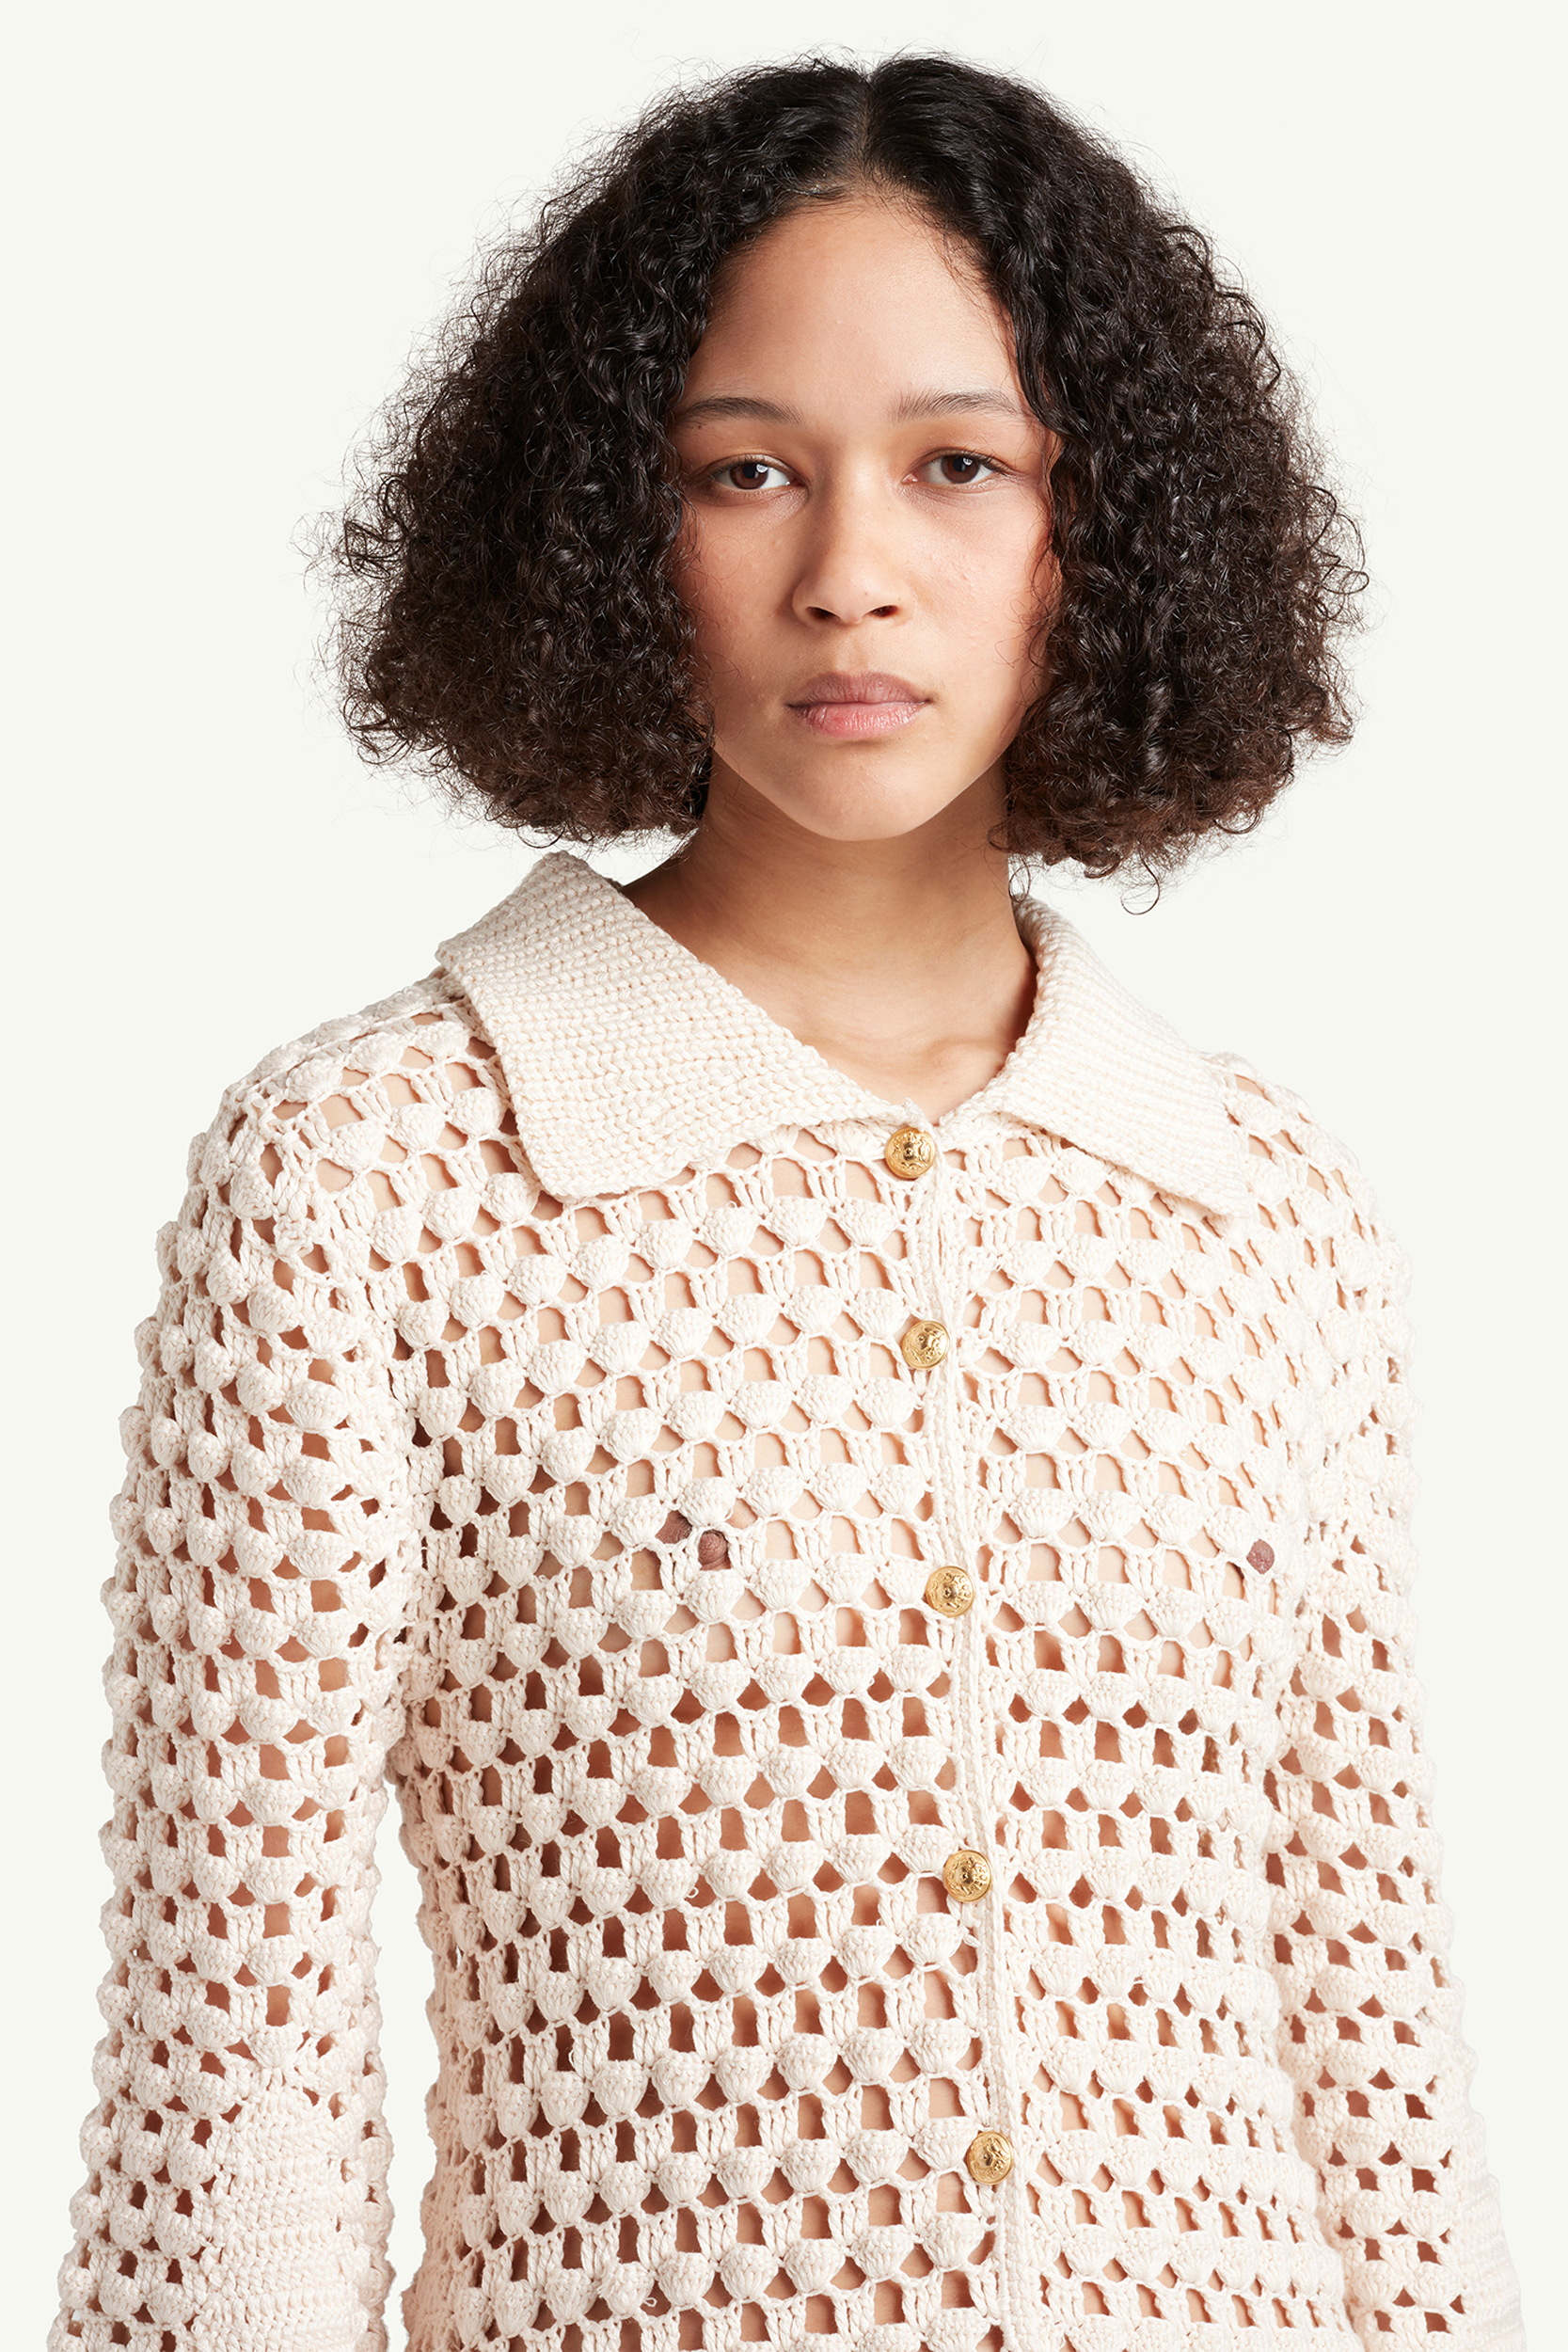 Womenswear model portrait shot wearing Wales Bonner Womenswear Model wearing a white see-through knitted dress | ecommerce photography London